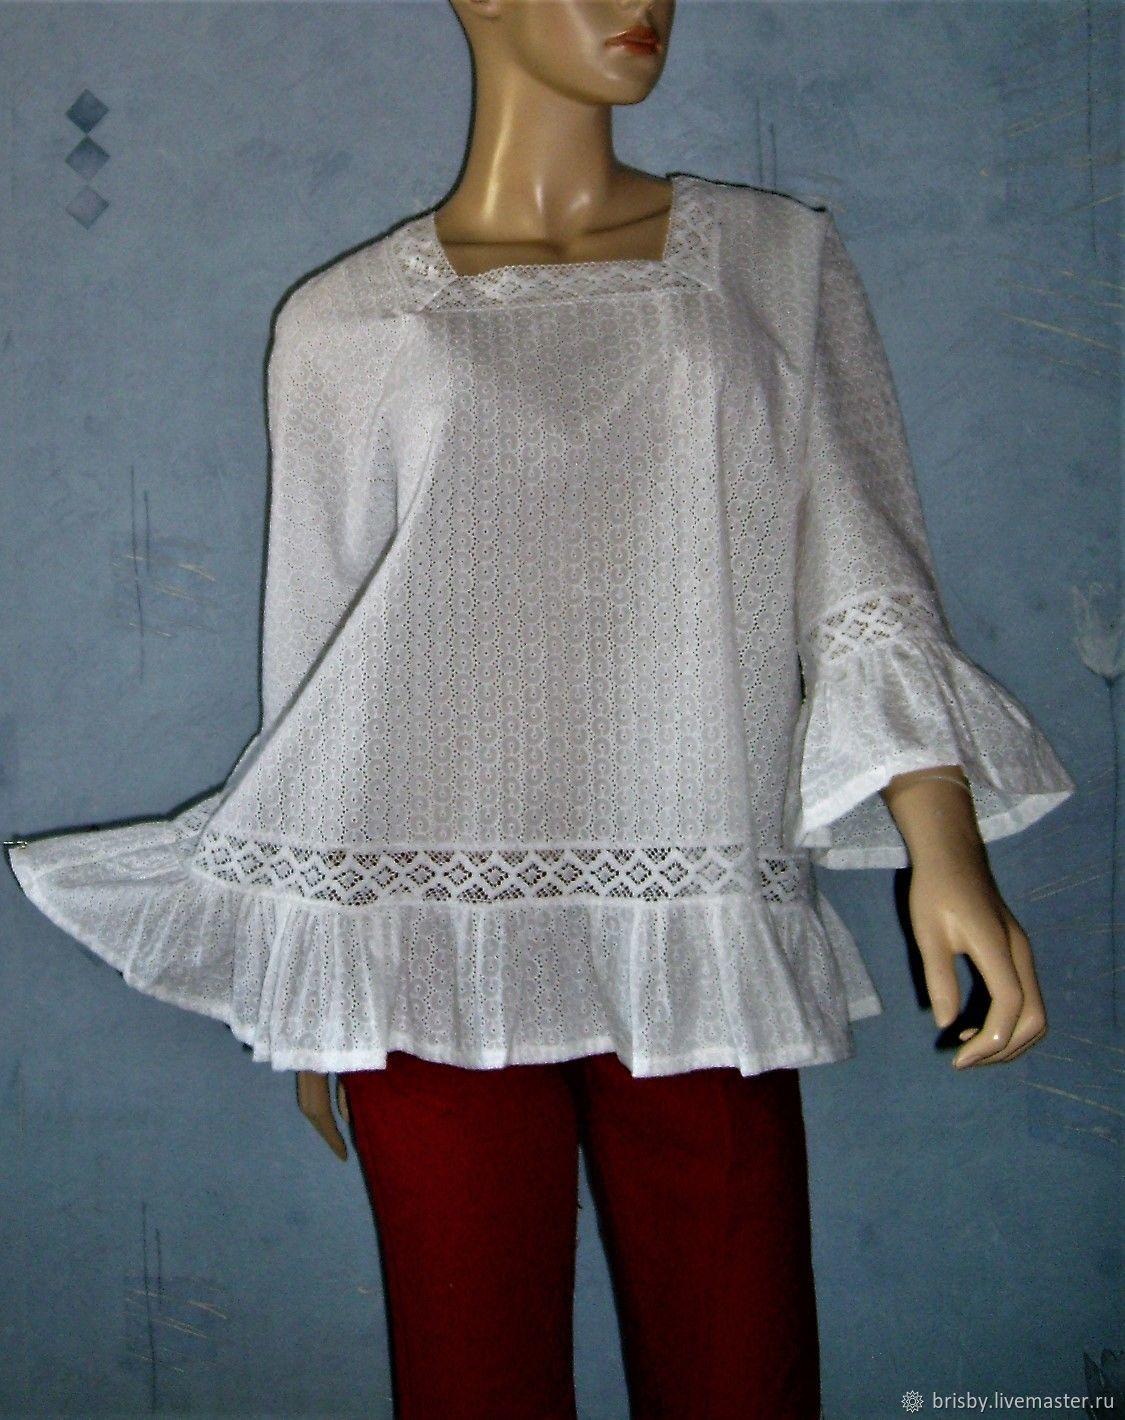 be4c3ec6435 Blouses handmade. Livemaster - handmade. Buy Blouse stitching white lace.